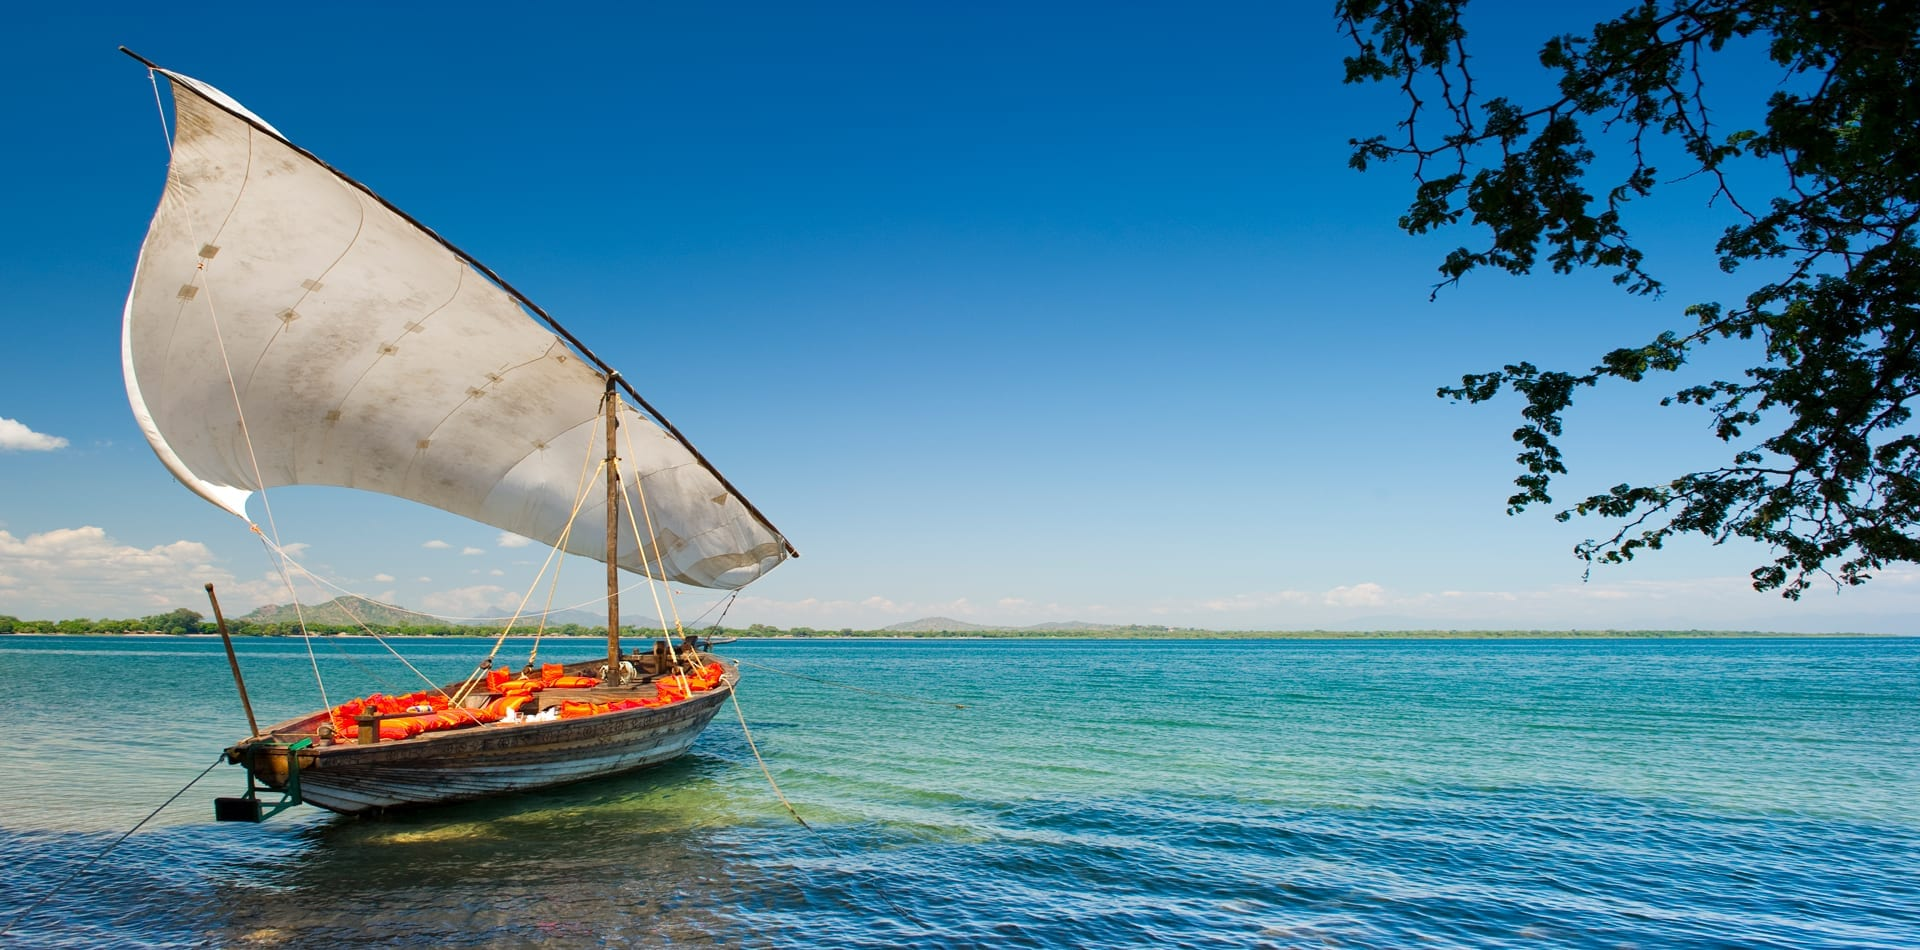 Malawi Pumulani Boat Experience